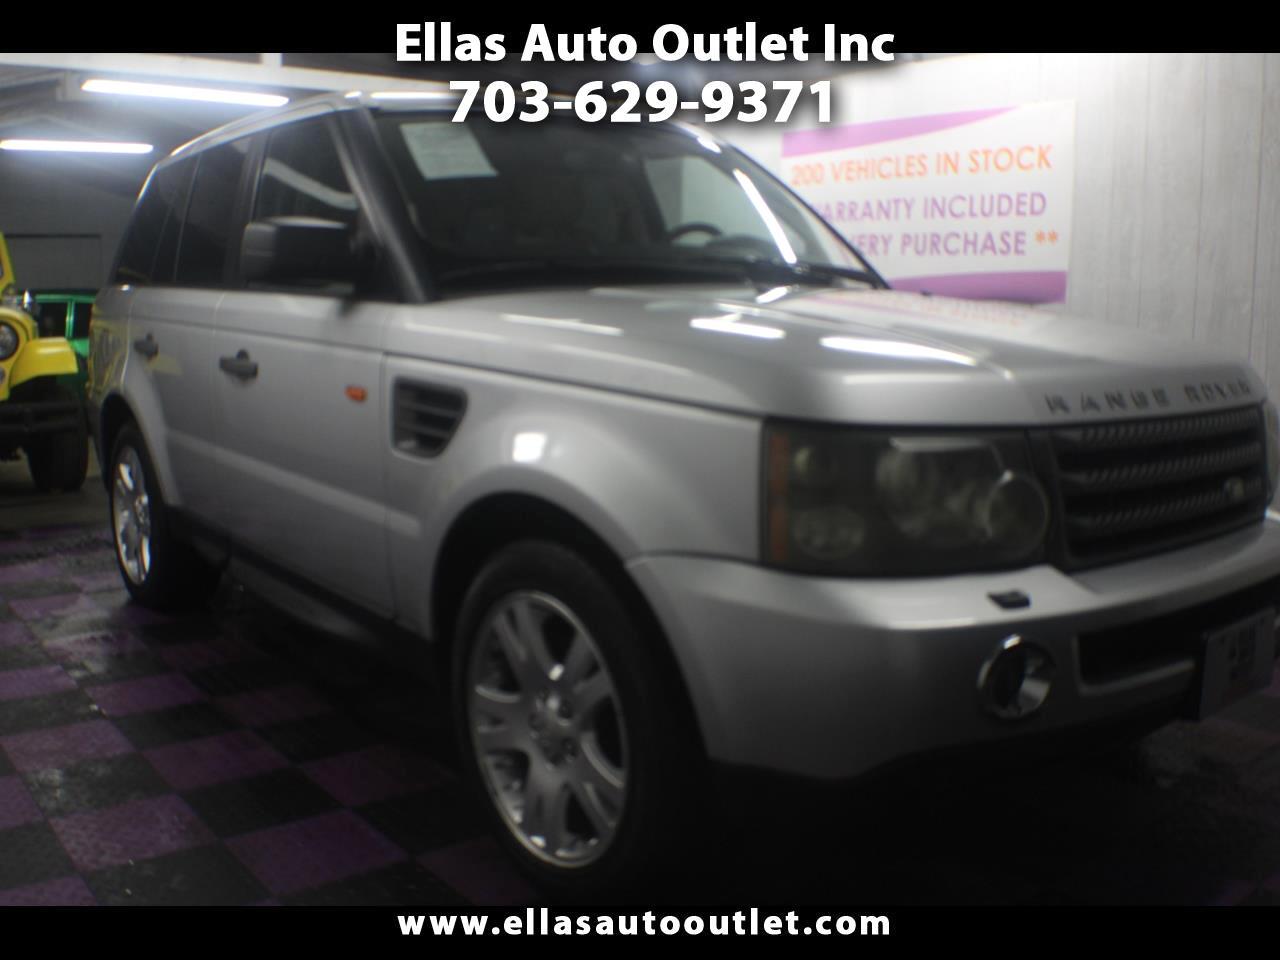 2006 Land Rover Range Rover Sport 4dr Wgn HSE